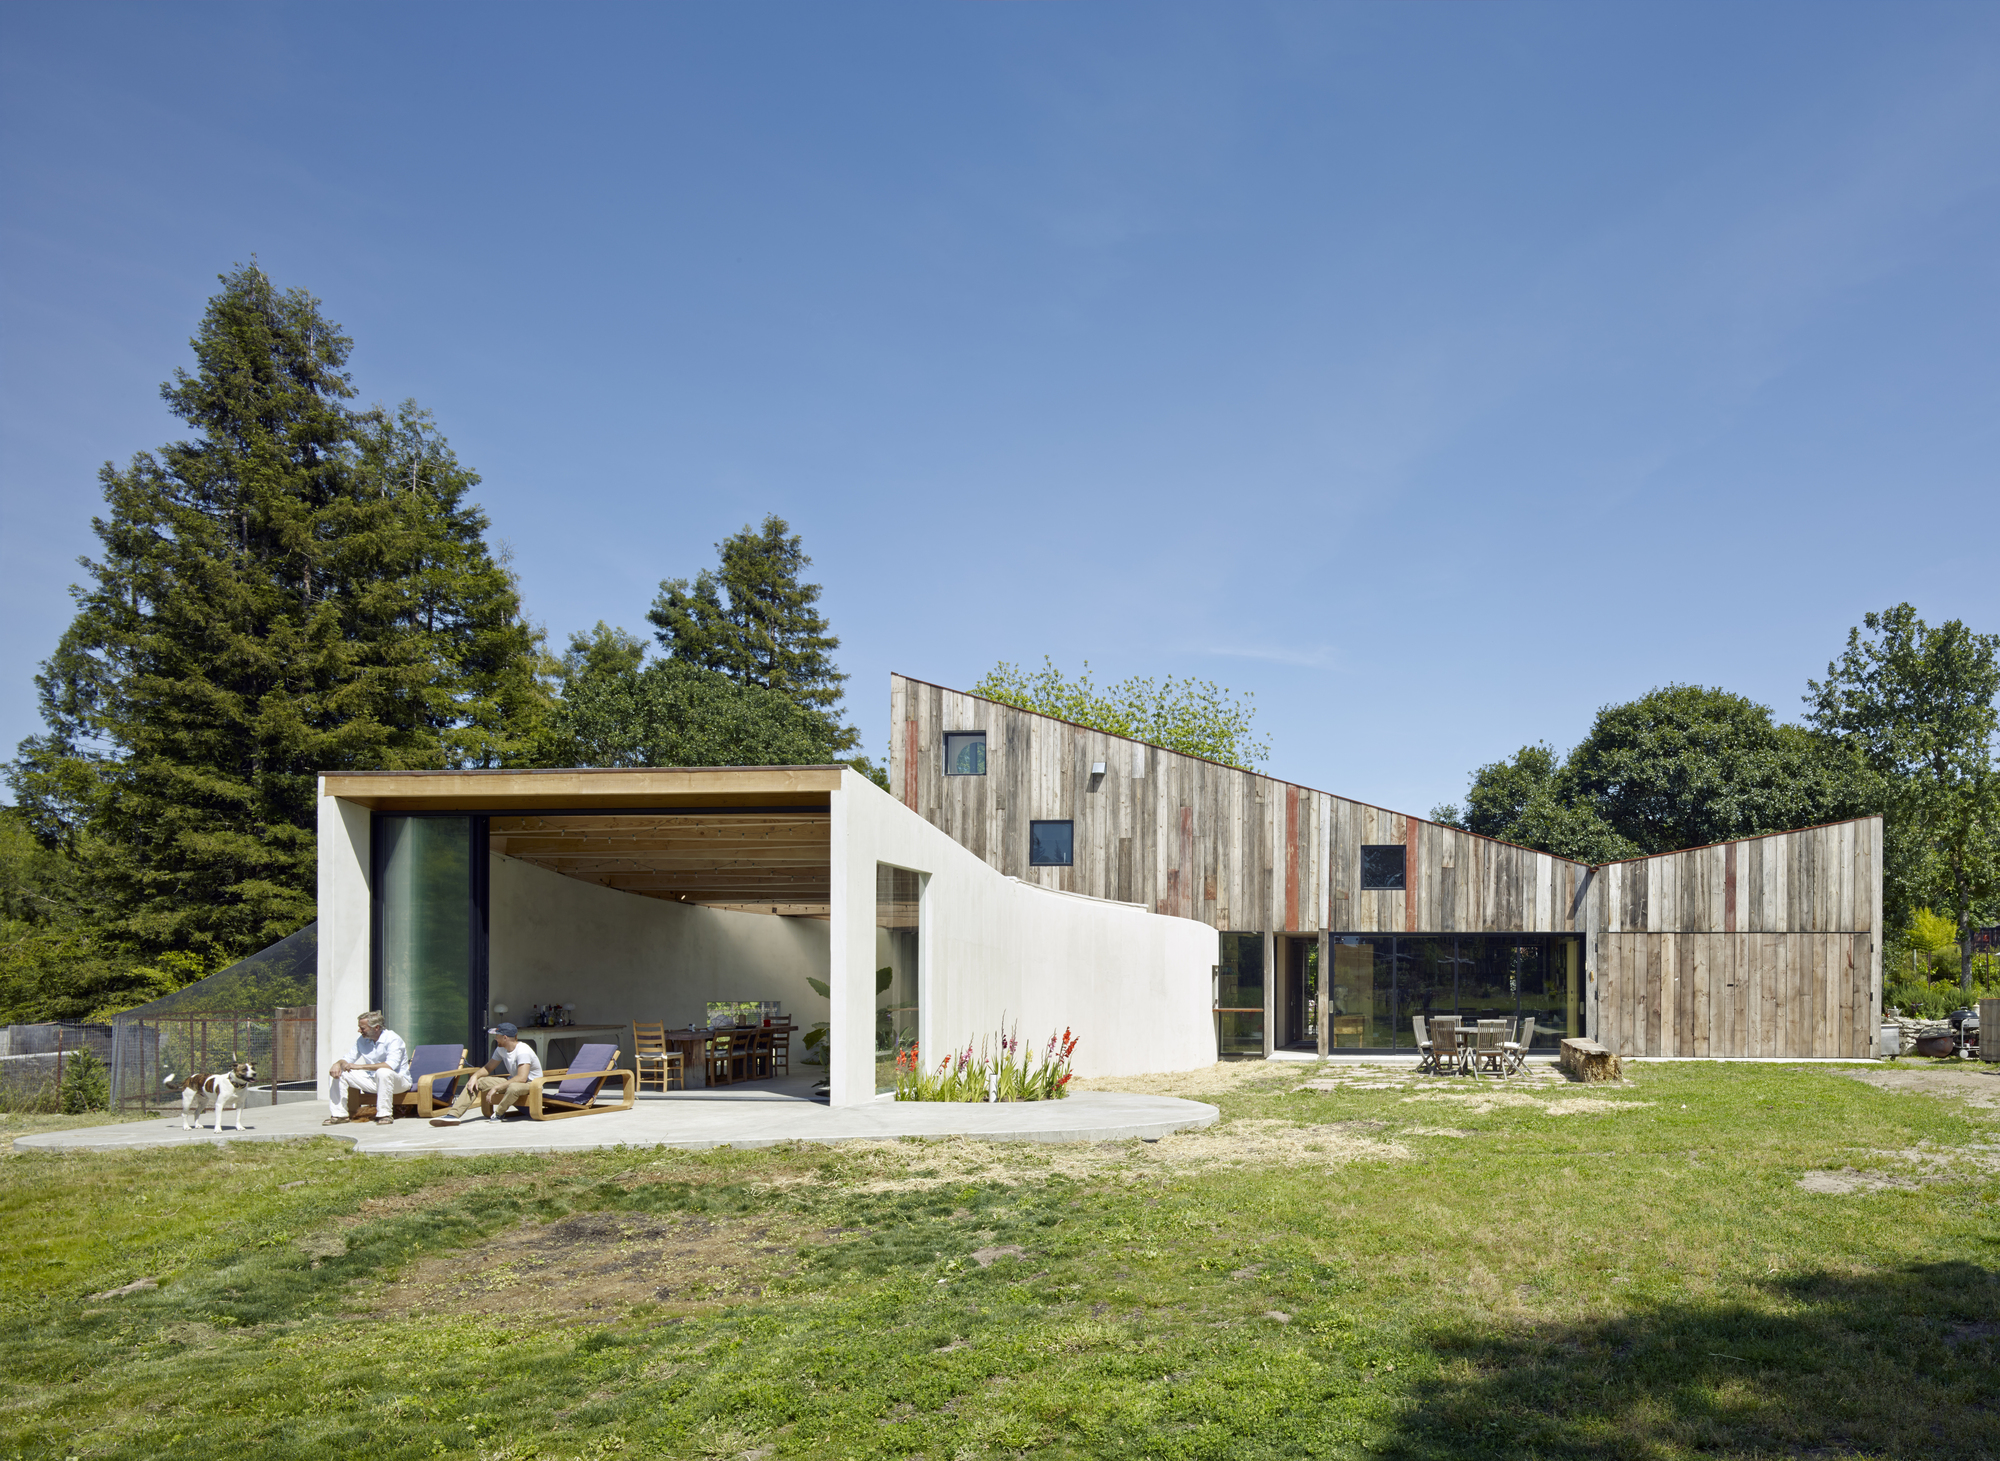 Gallery Of Artist Studio In Sonoma Mork Ulnes Architects 5